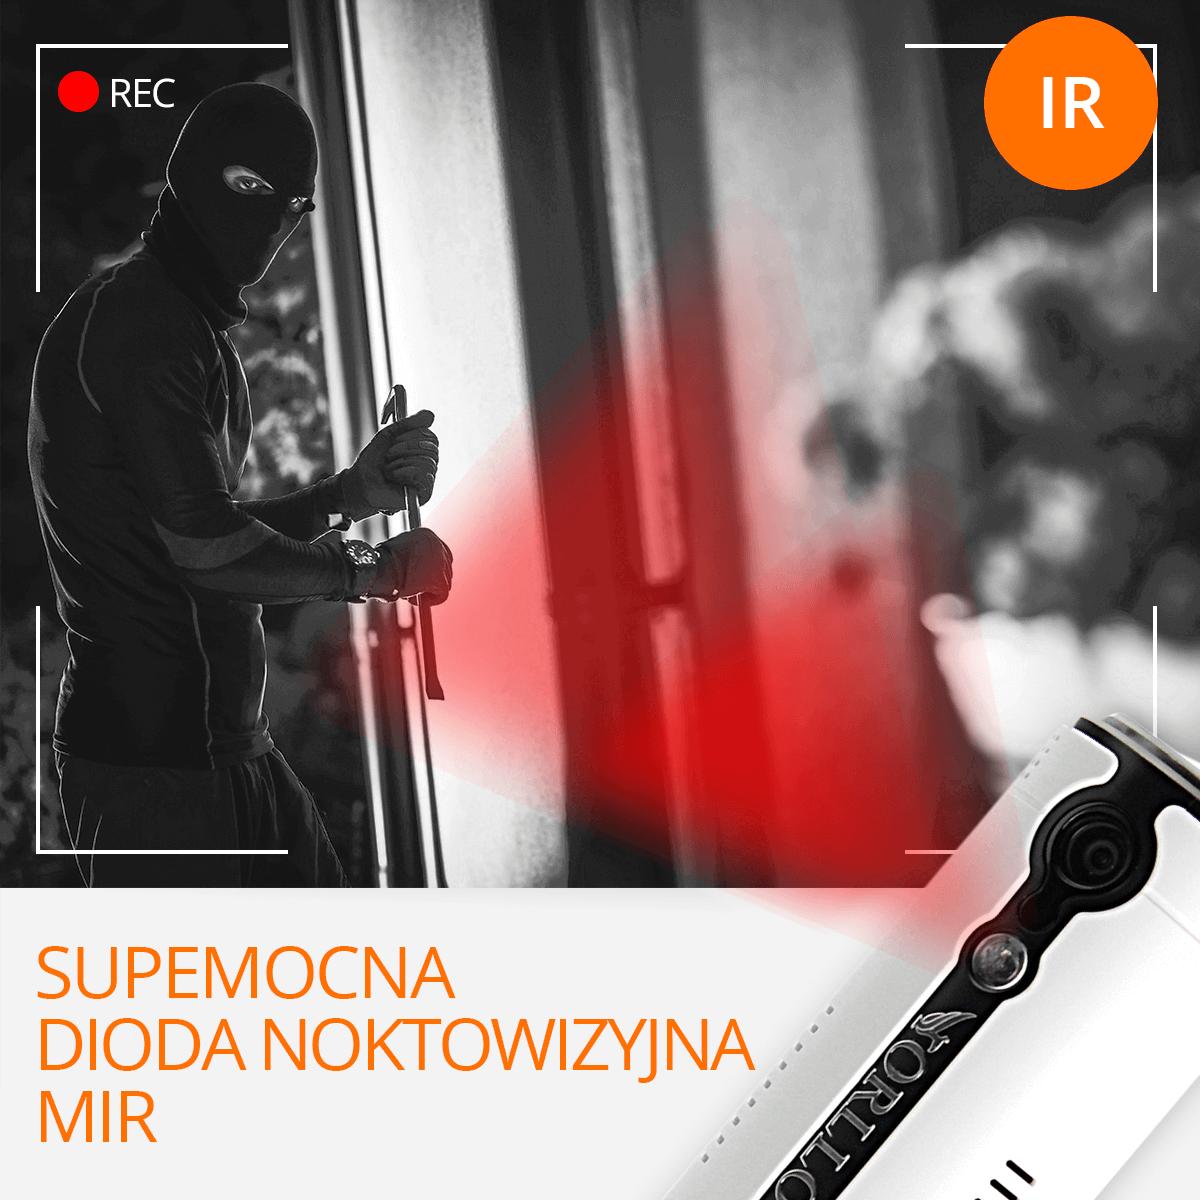 kamera-nagrywania-w-nocy-orllo-pl